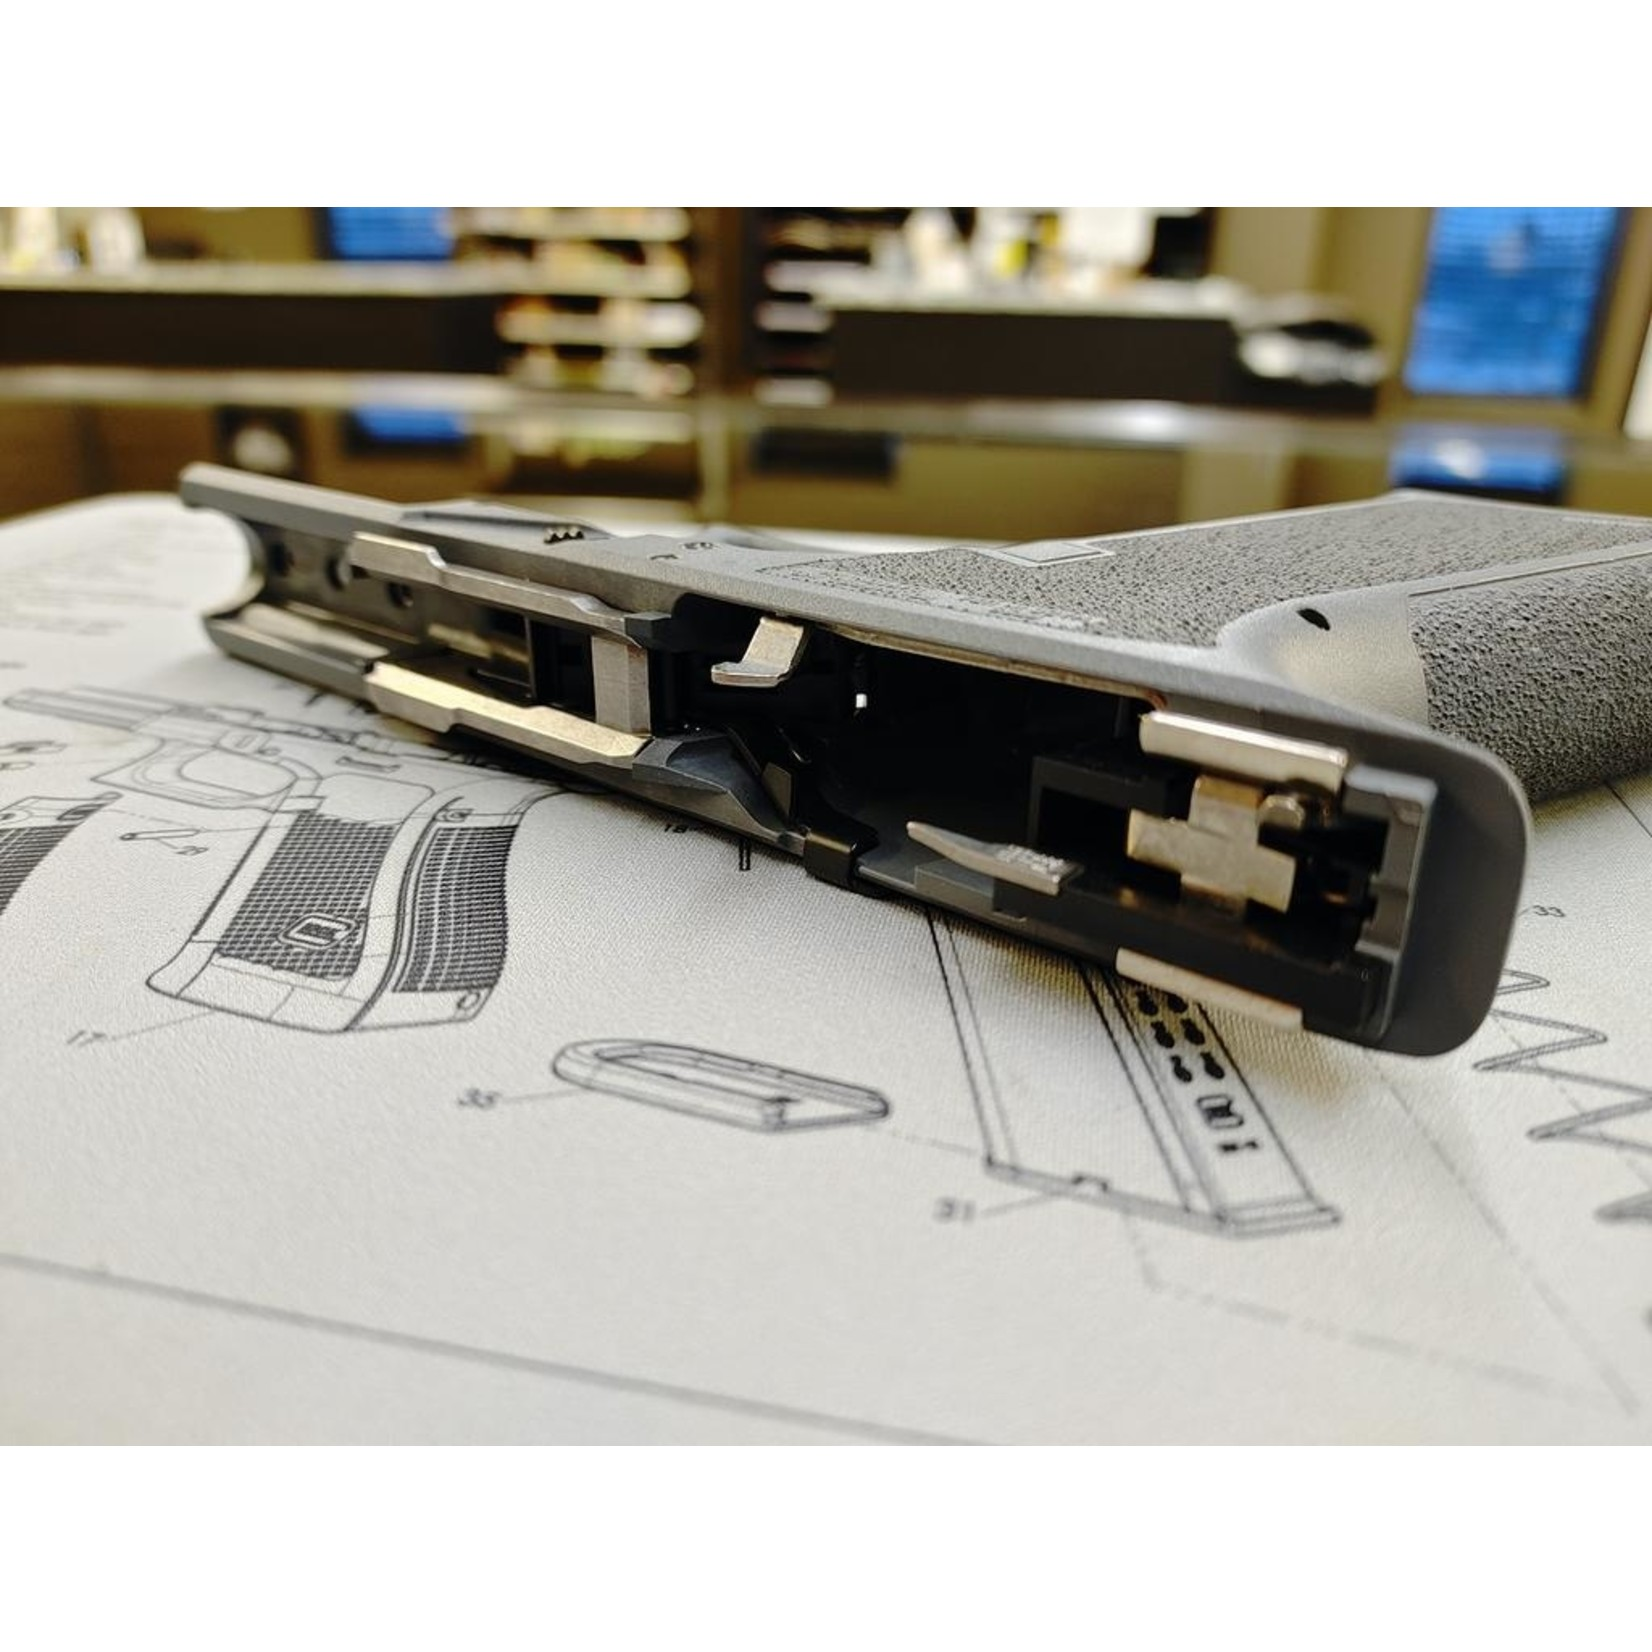 Poly80 PFS9 Serialized Standard Frame - Gray, Fully Assembled,  LPK installed